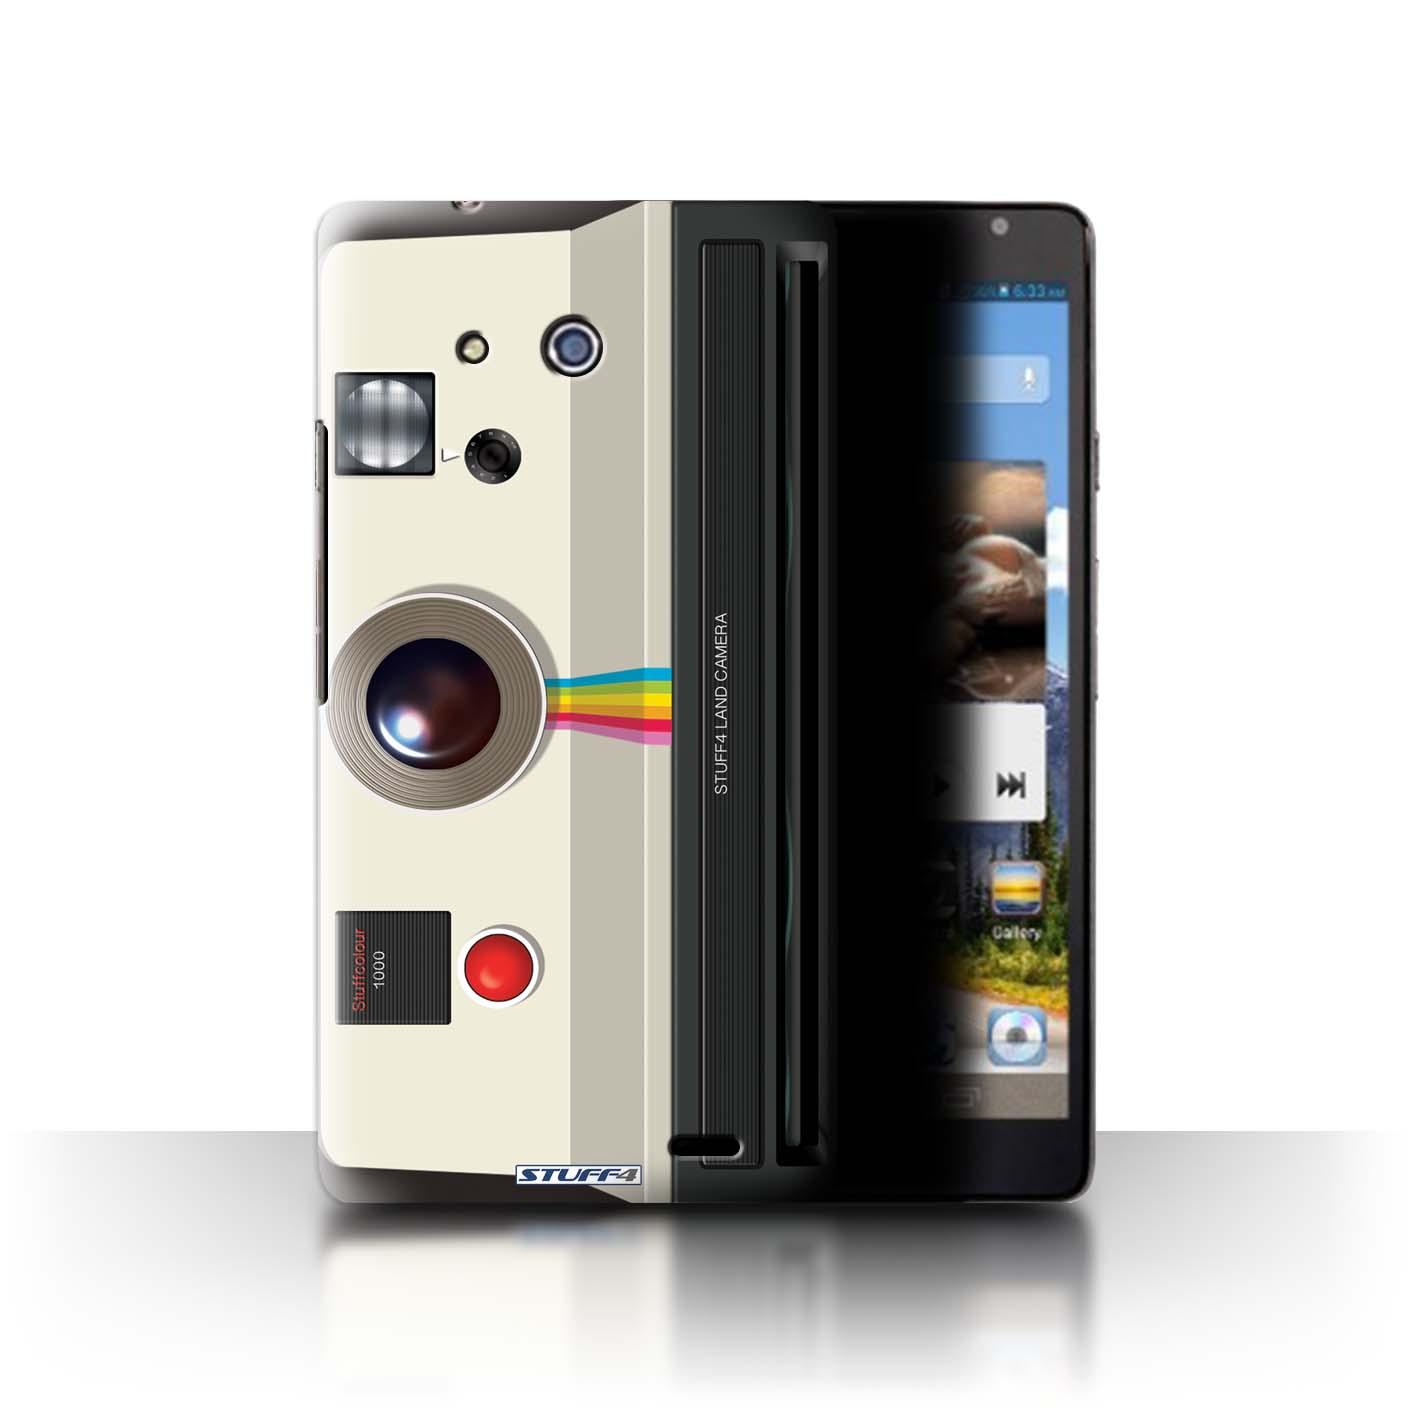 STUFF4 Phone Case/Back Cover for Huawei Ascend Mate /Camera